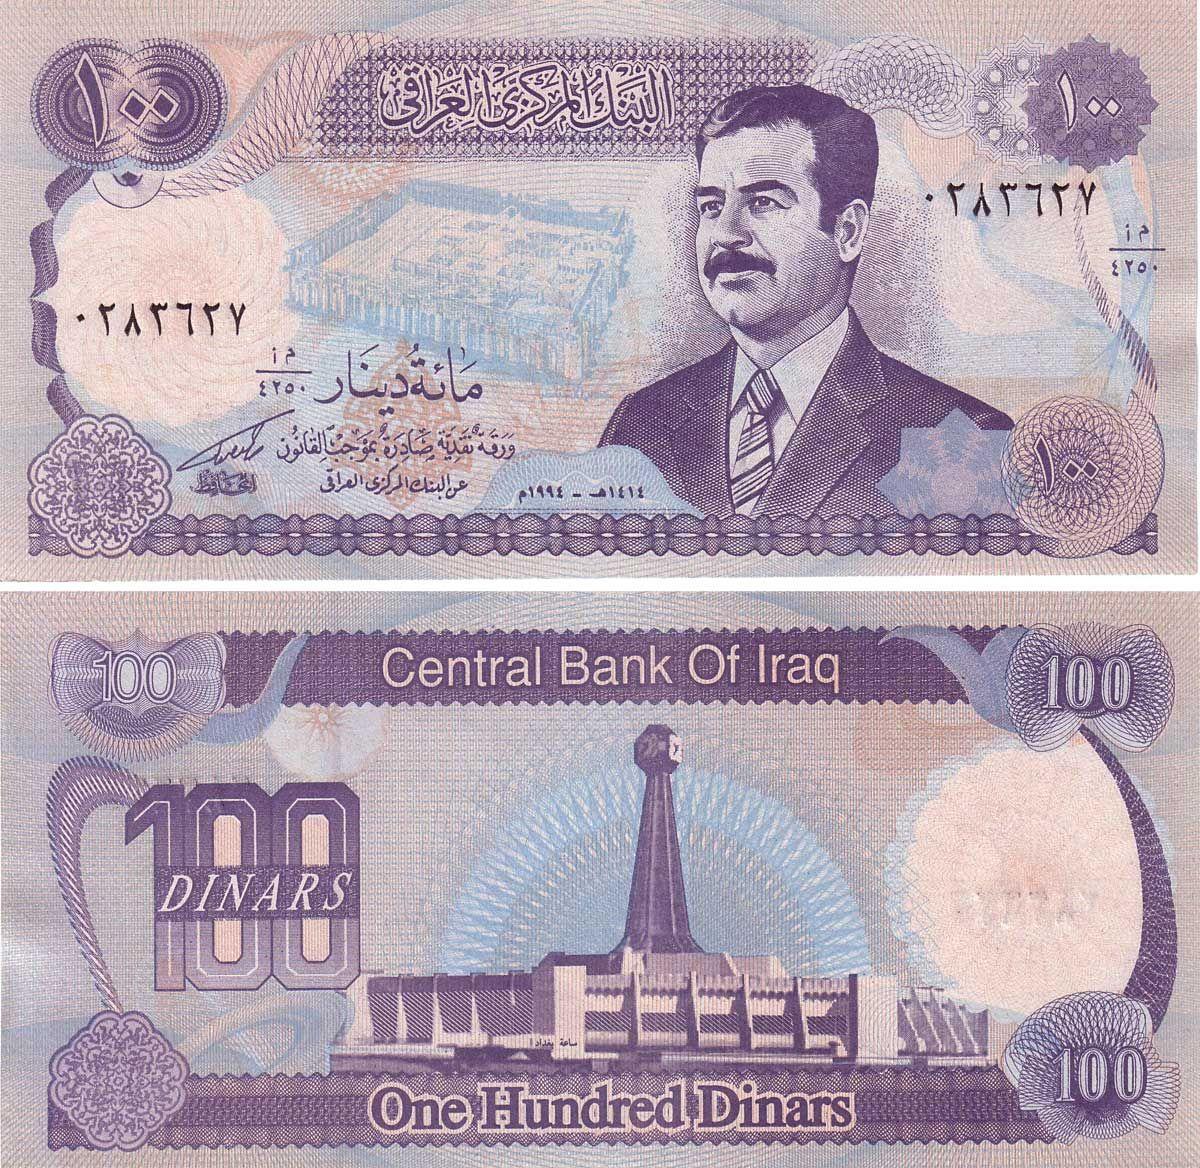 Issues Dinar Baru Iraq Iraq Money 50 Dinar Note New News To Go 3